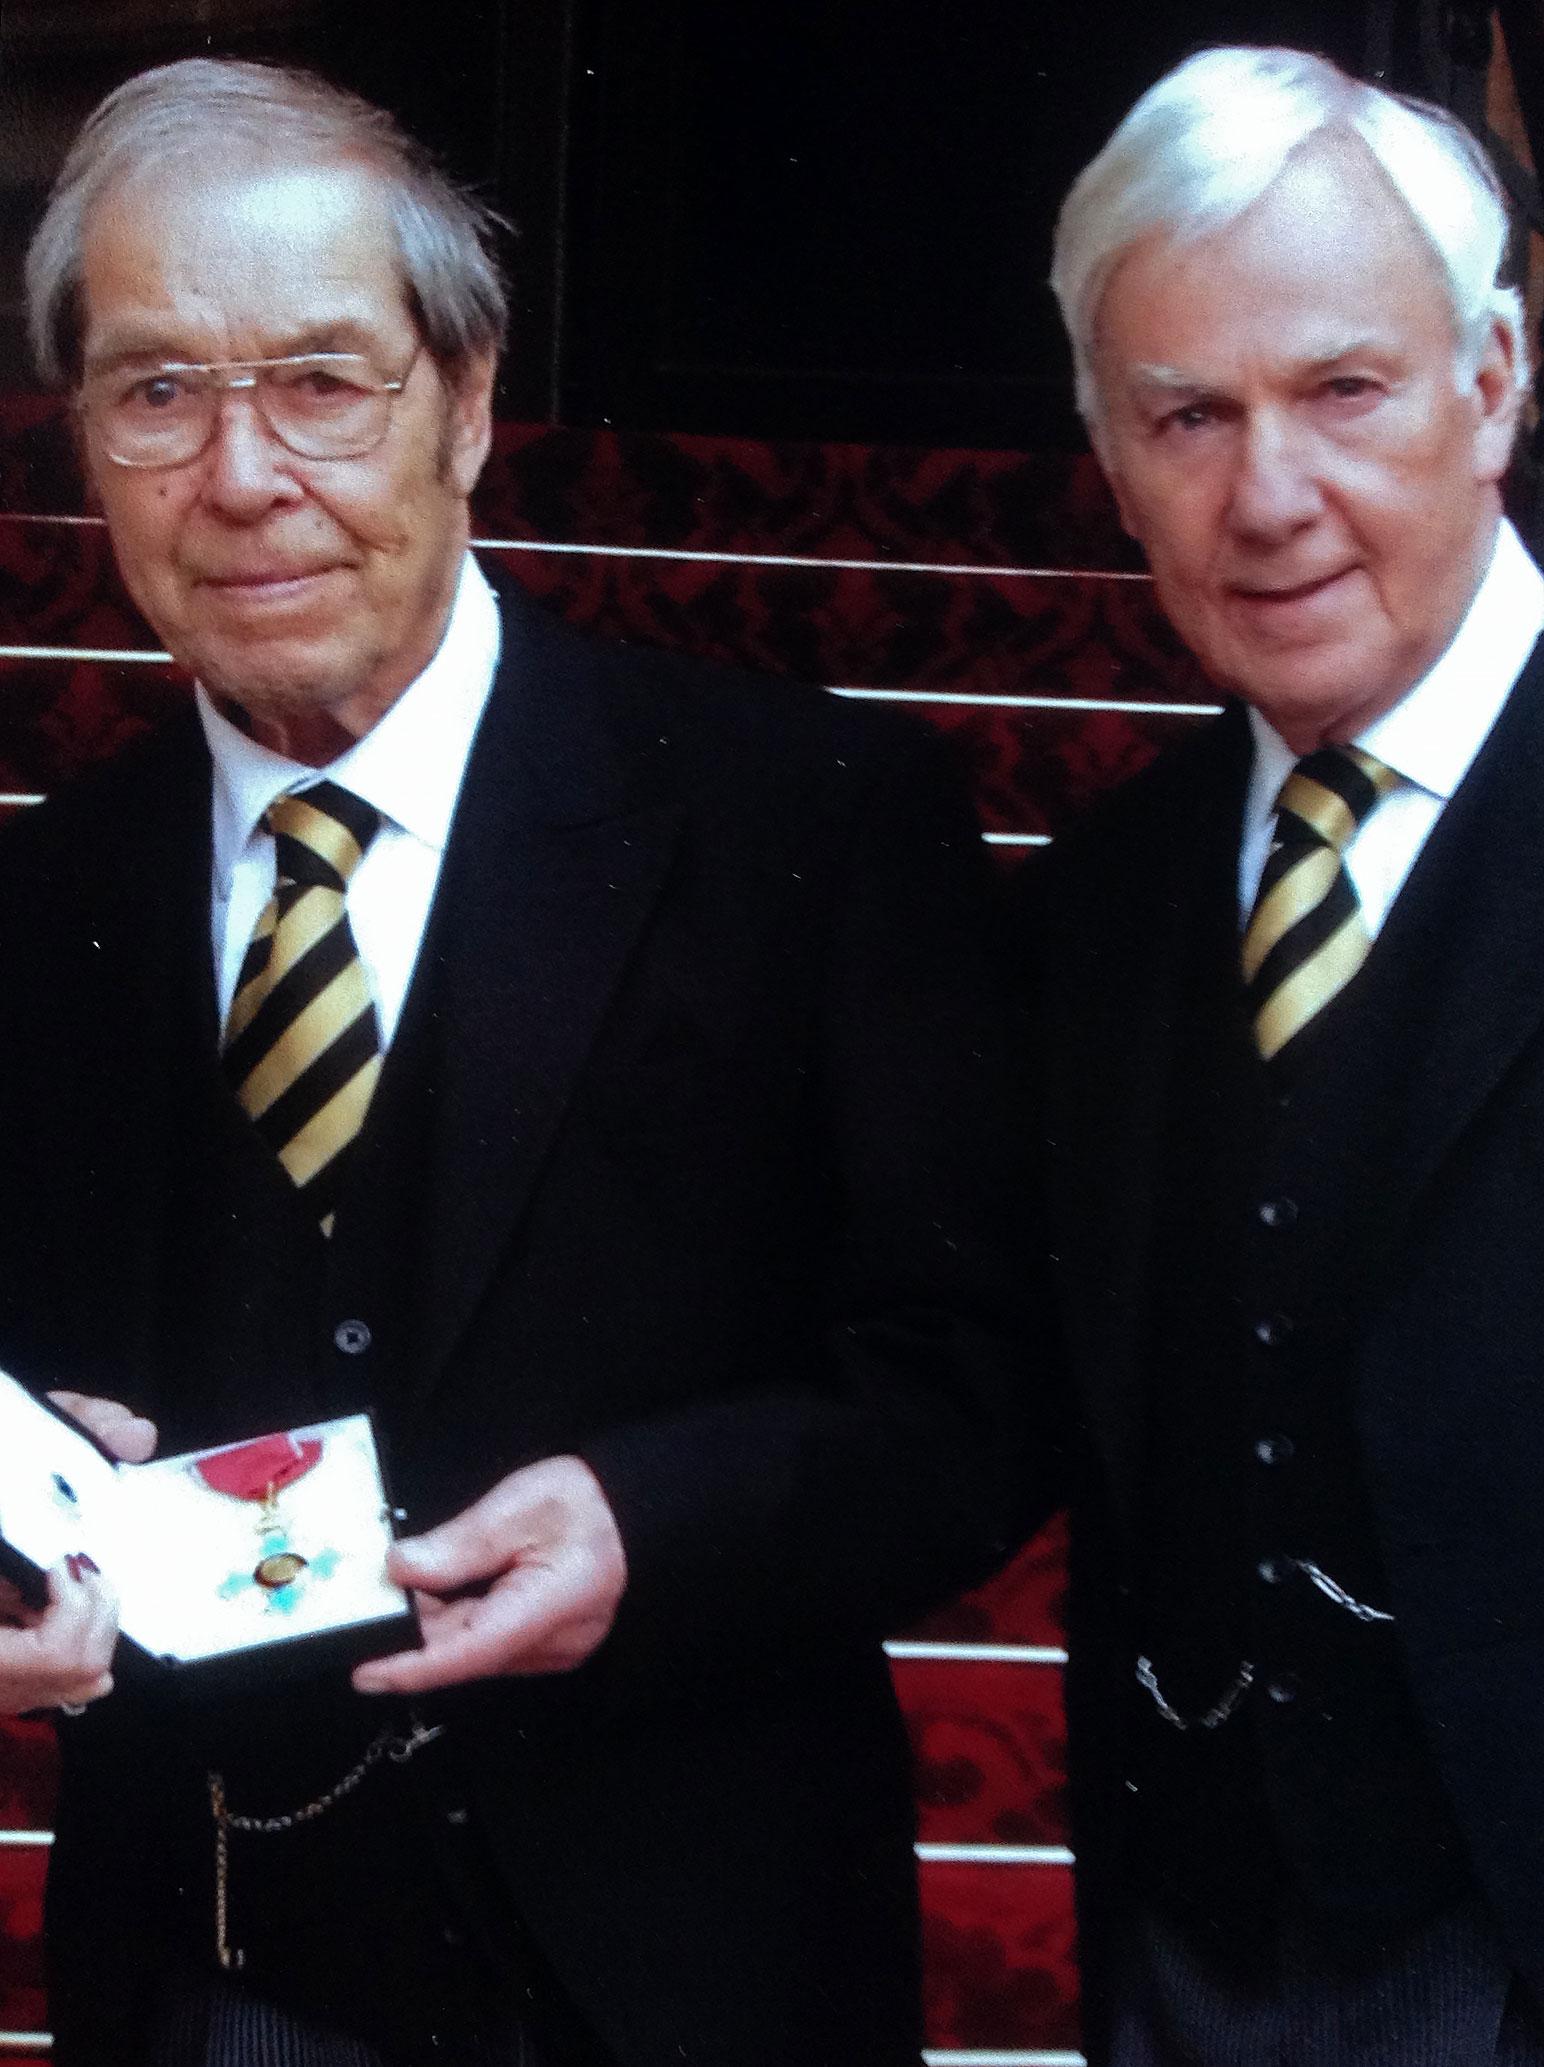 George Daniels and David Newman